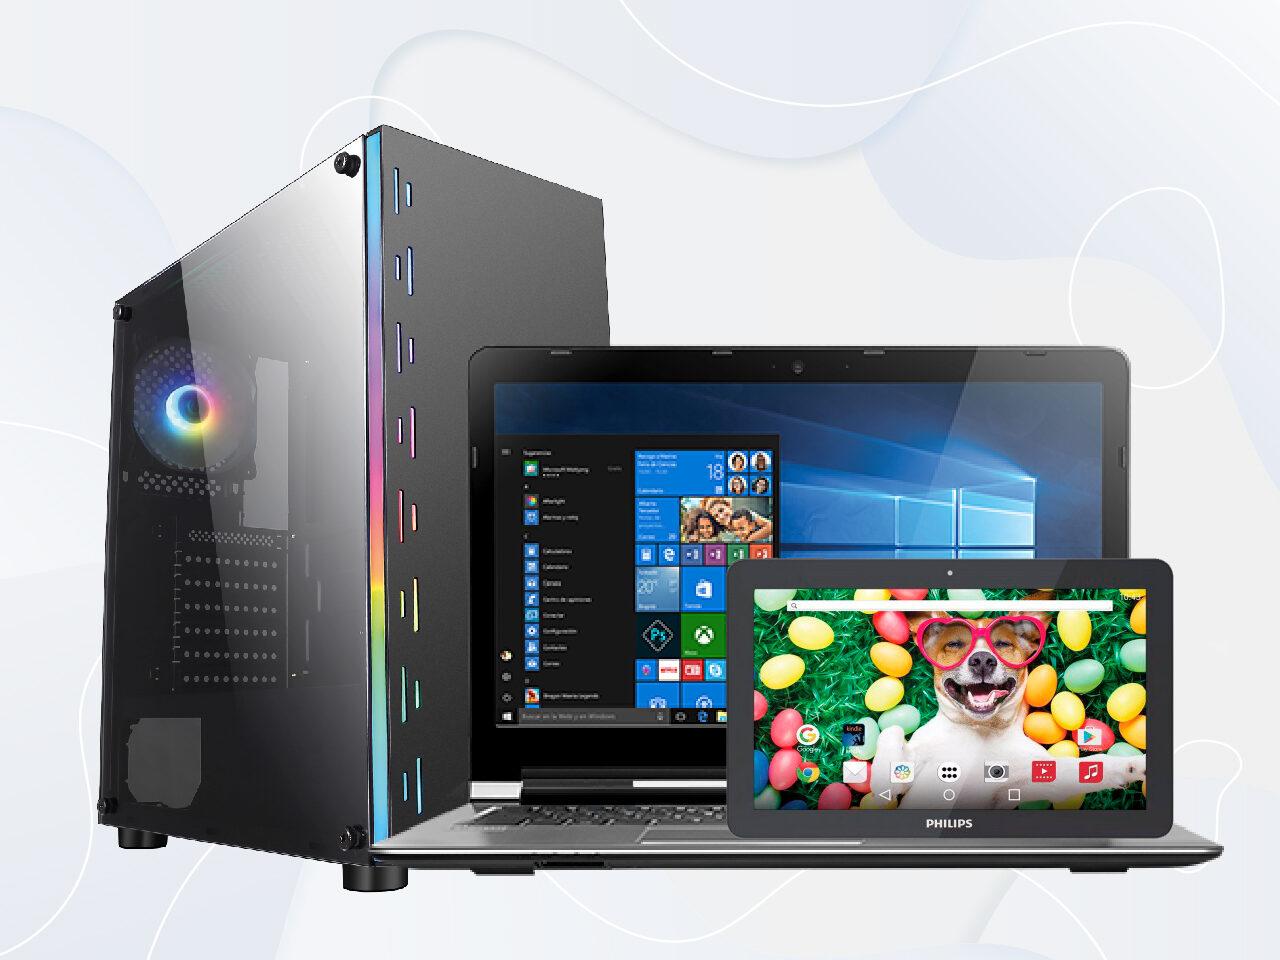 http://grupofixon.com/wp-content/uploads/2021/06/productos-02-1-1280x960.jpg